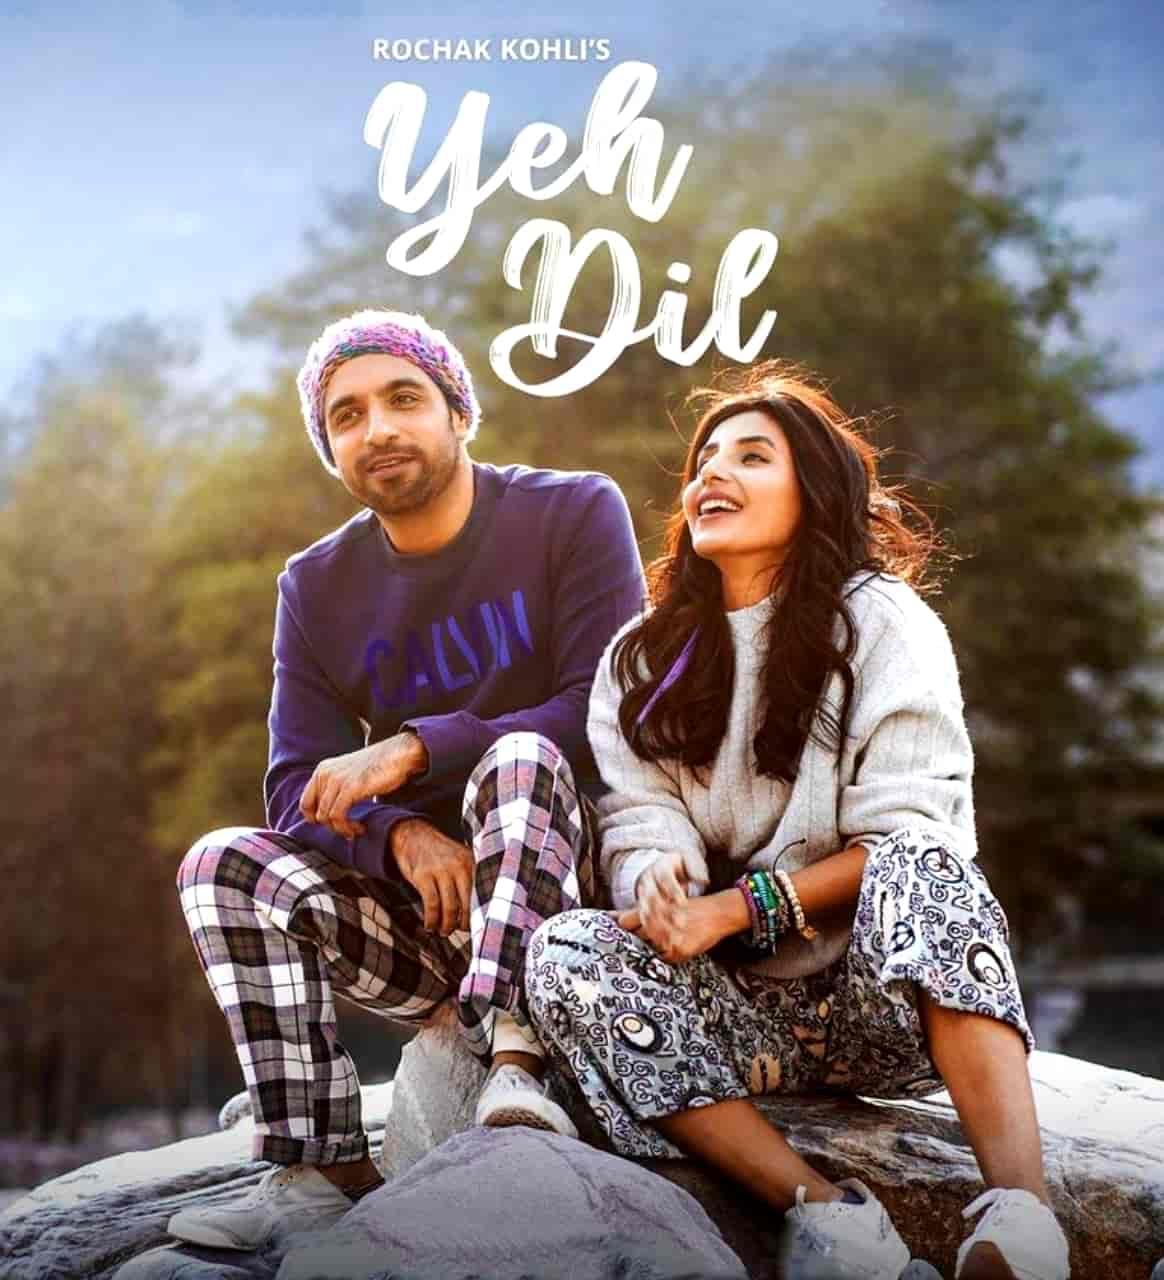 Rochak Kohli New Song Yeh Dil Image.